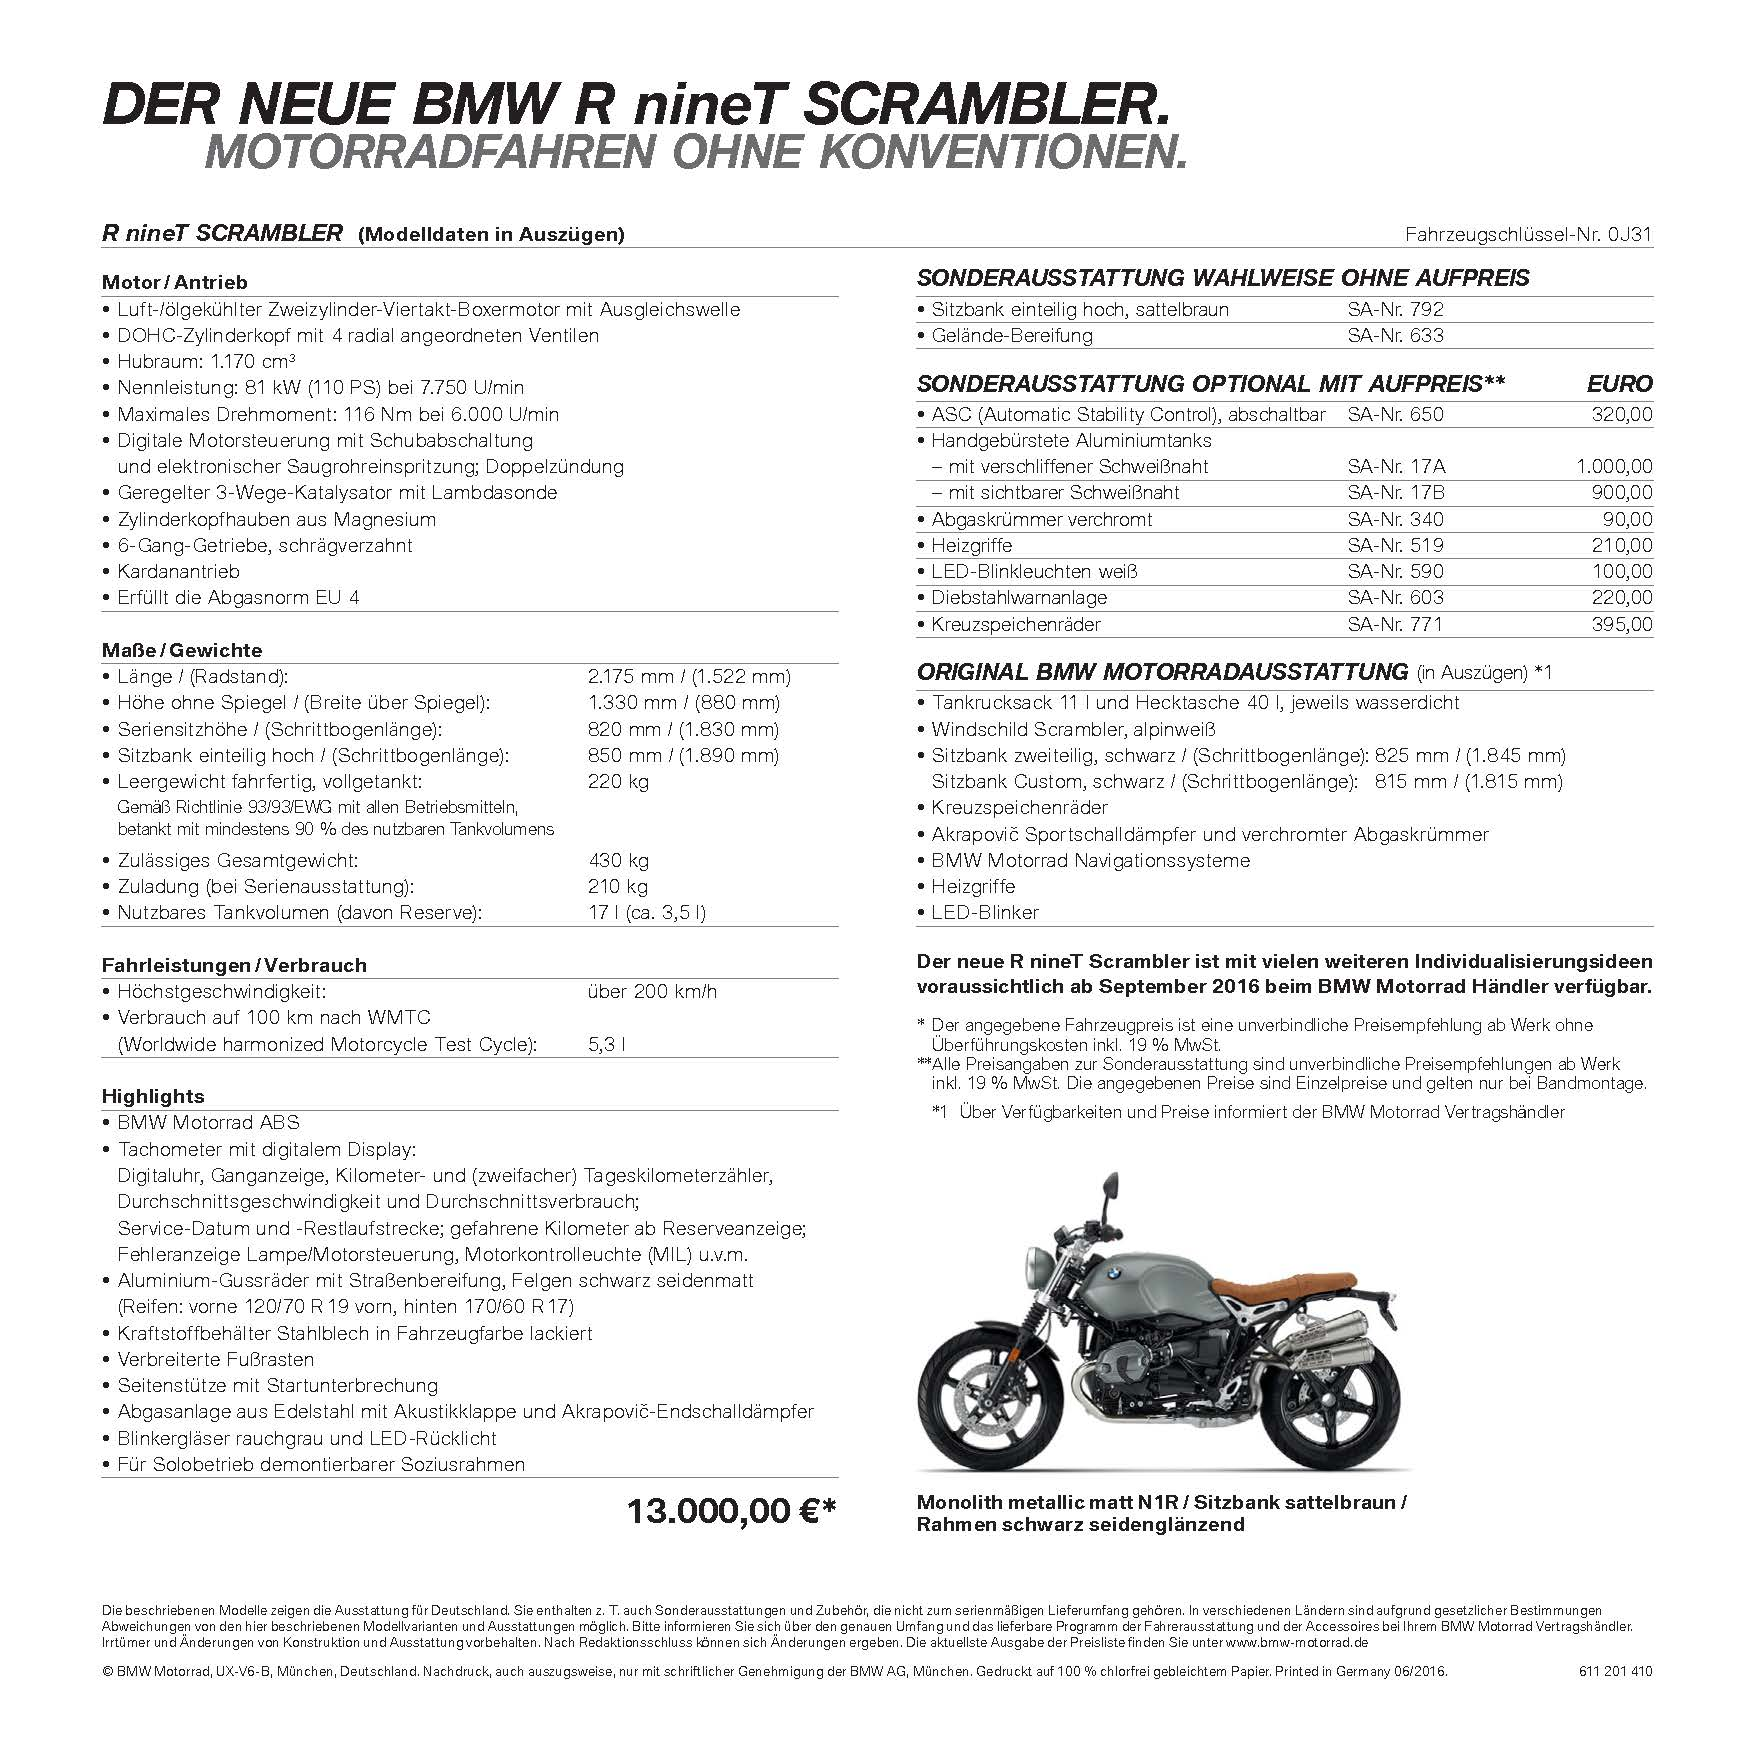 download_preisblatt_rninet_scrambler_07-2016-www_24juni-1_seite_2.jpg